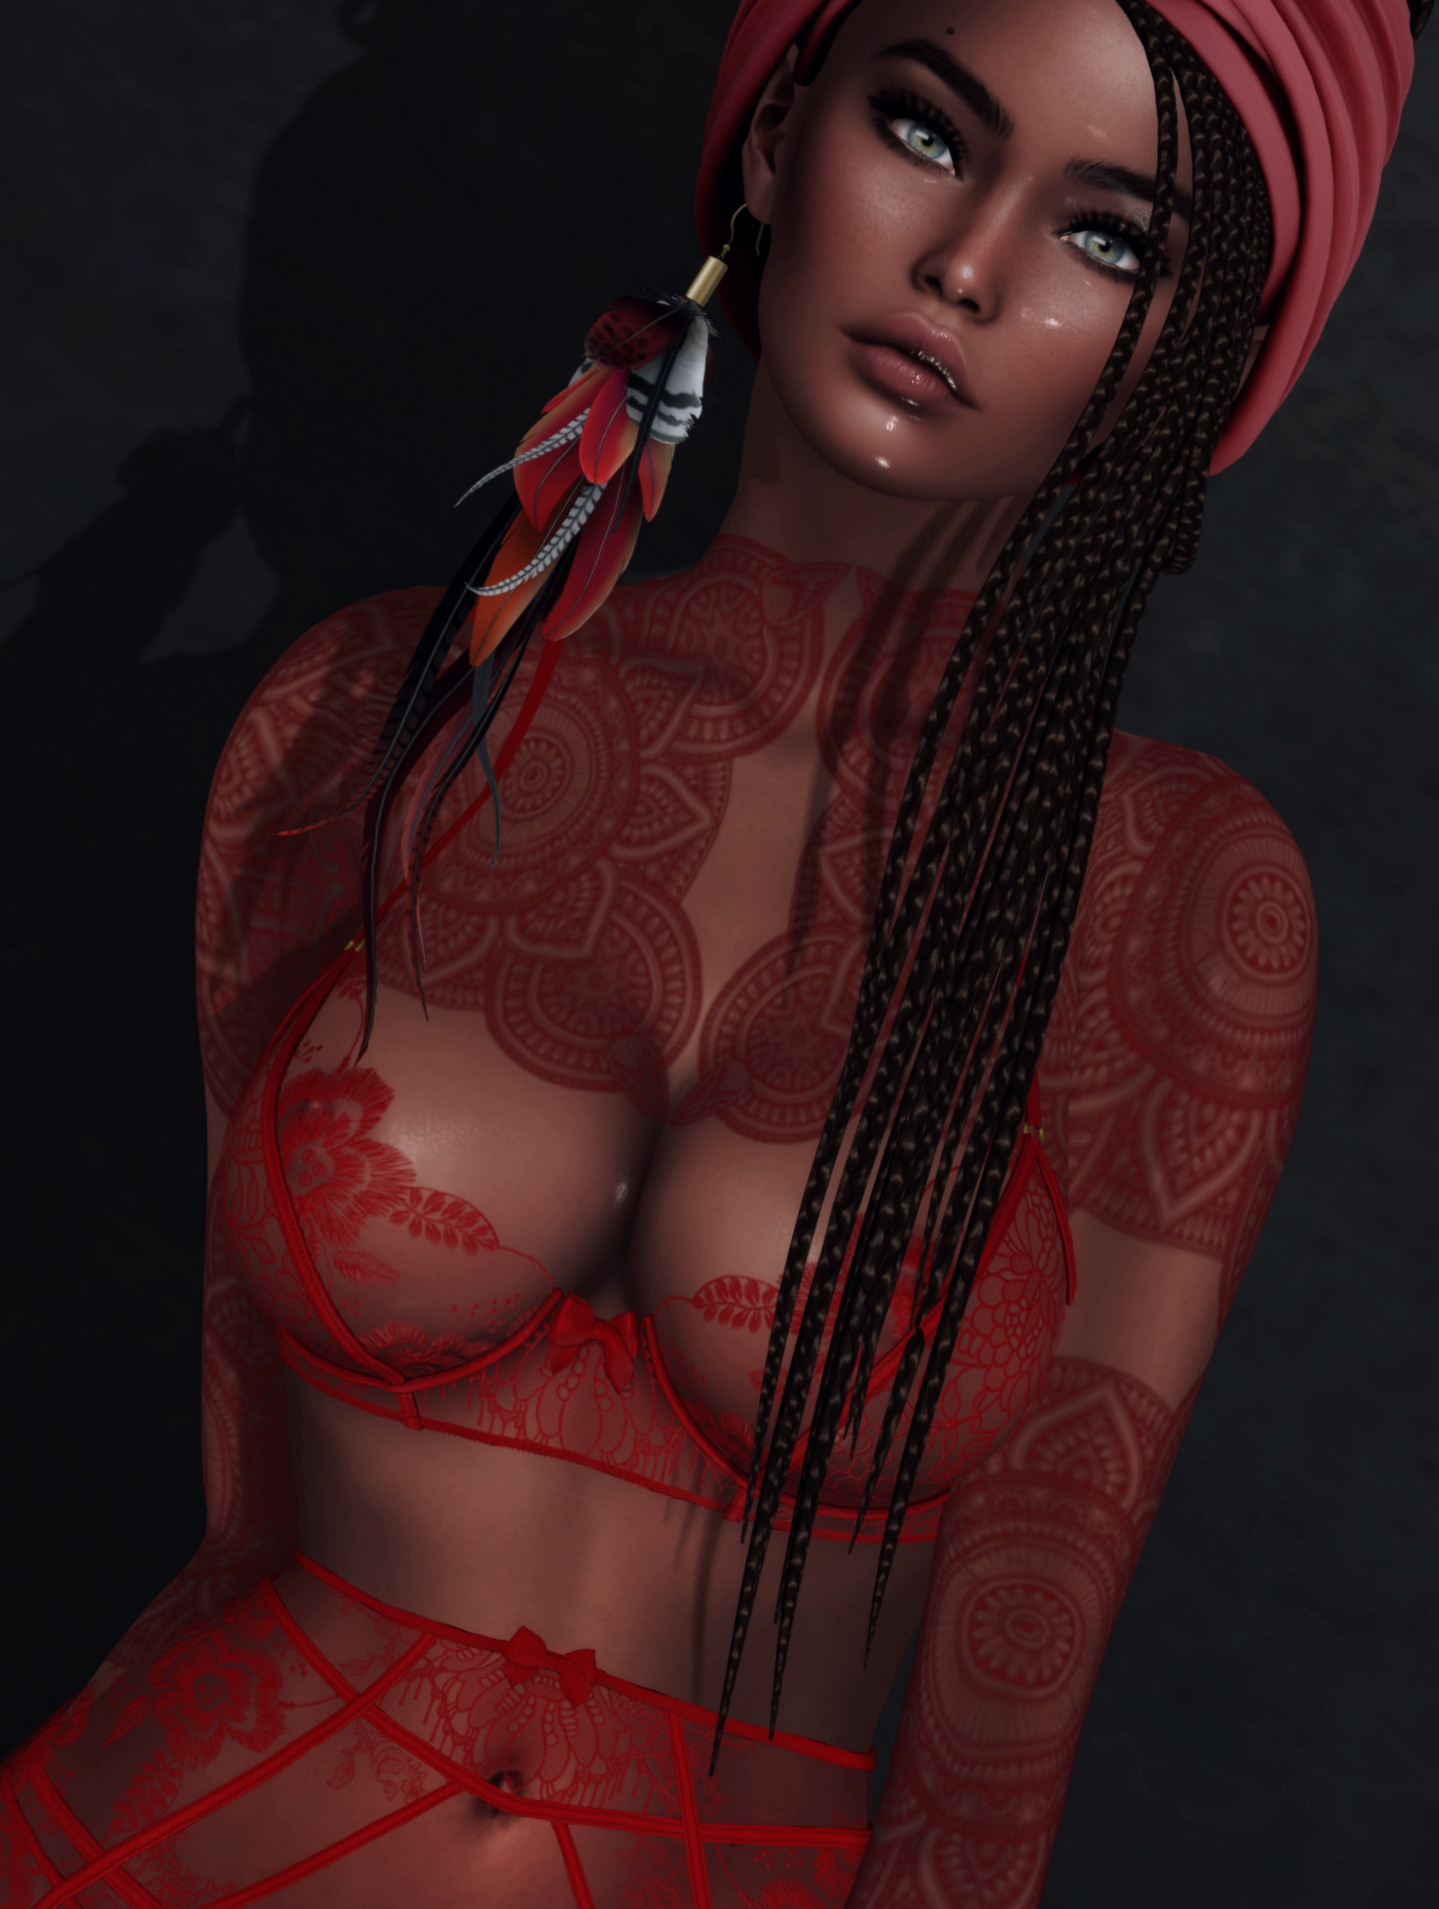 Snapshot_421a